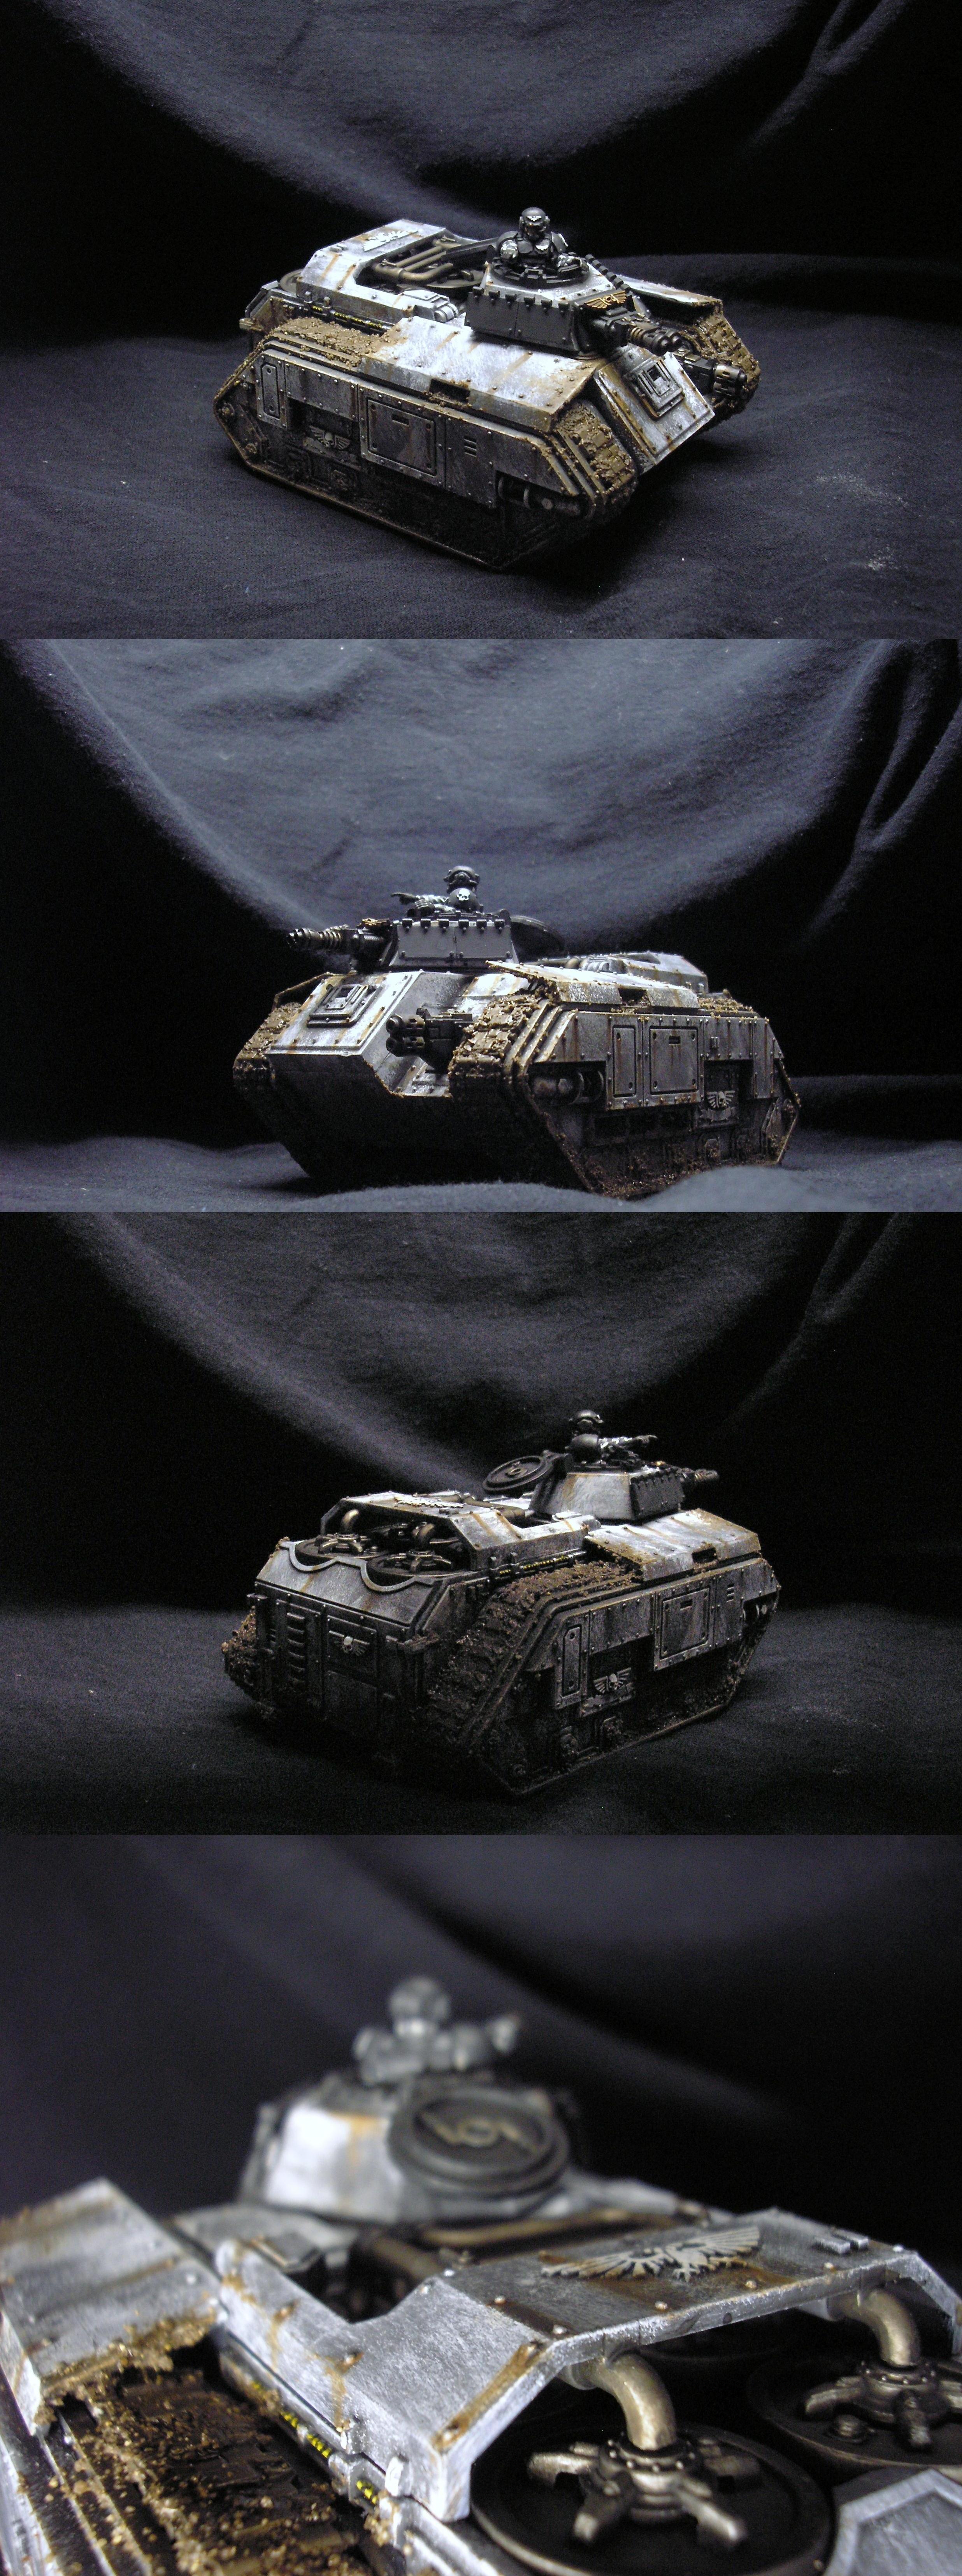 Astra Militarum, Cadians, Chimera, Chimera Chassis, Hellhound, Imperial Guard, Mud, Muddy, Tank, Weathered